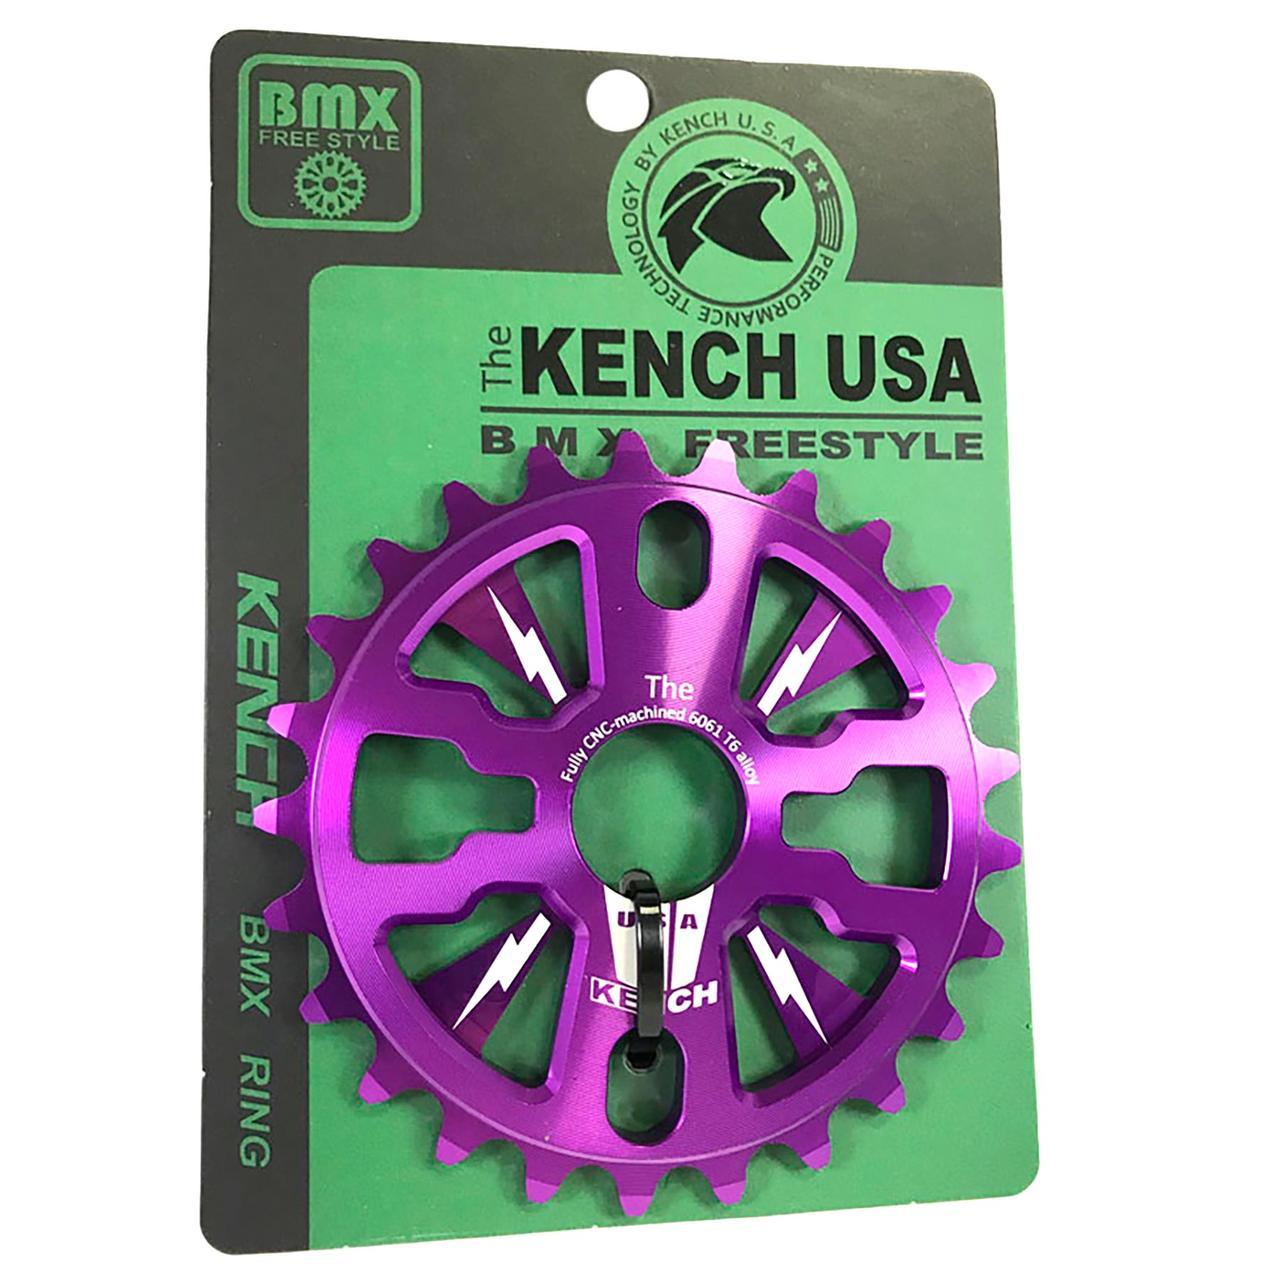 Звезда Kench KH-RN-01-ORG 25T для BMX пурпурный